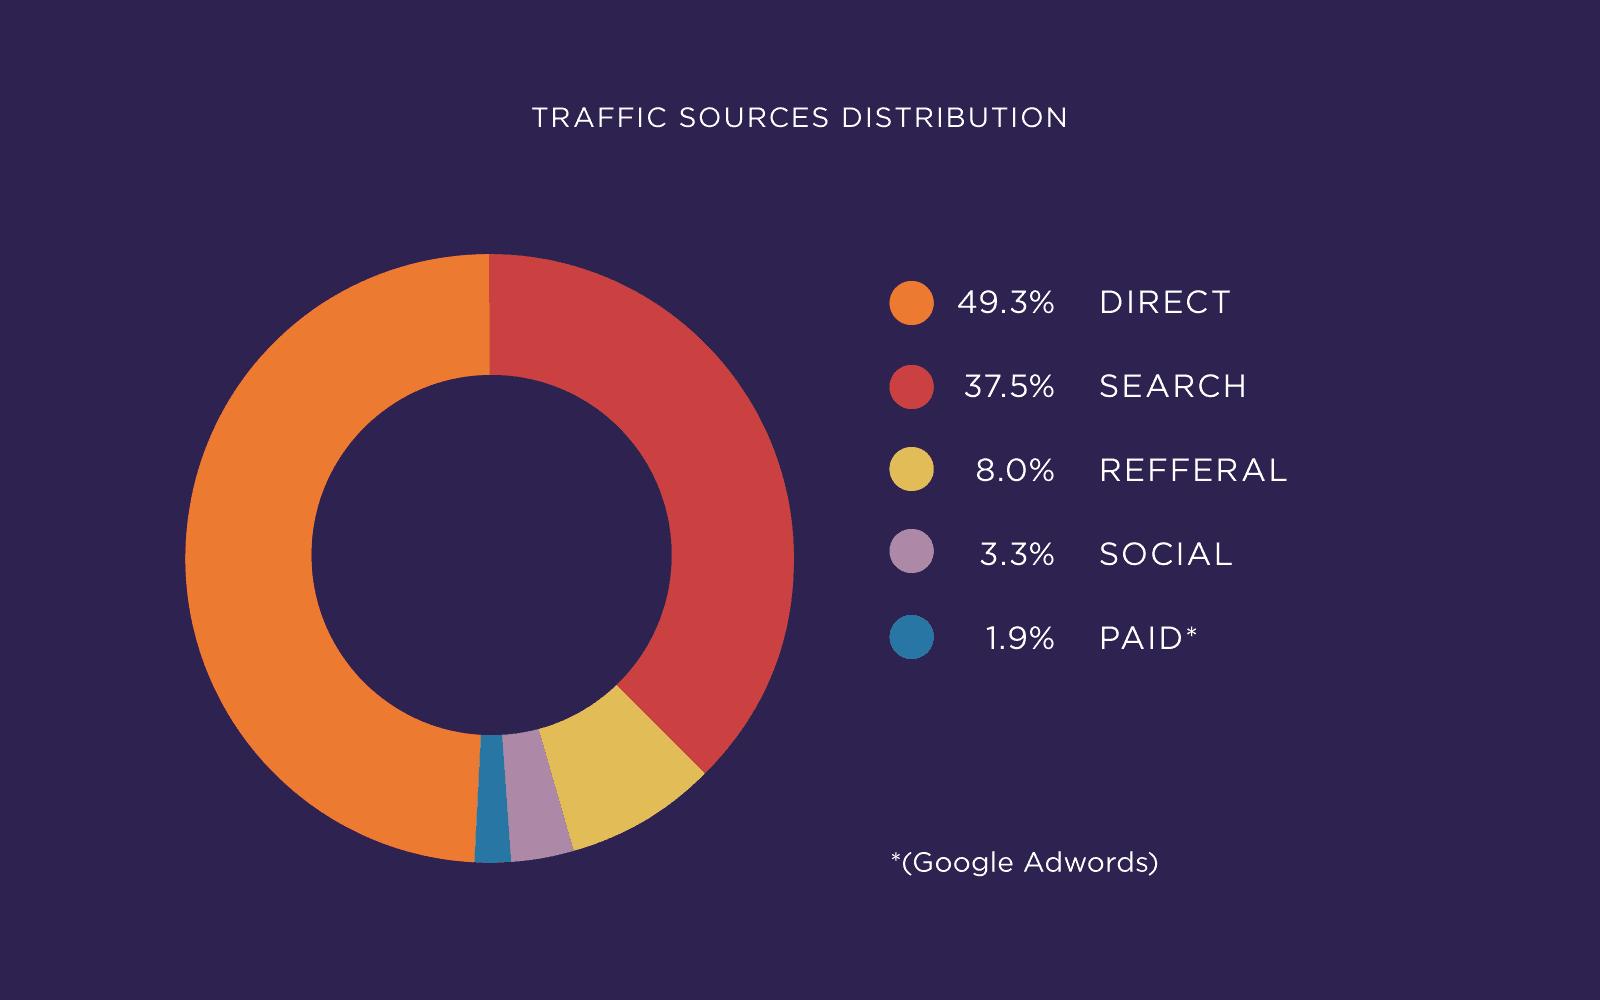 Traffic sources distribution